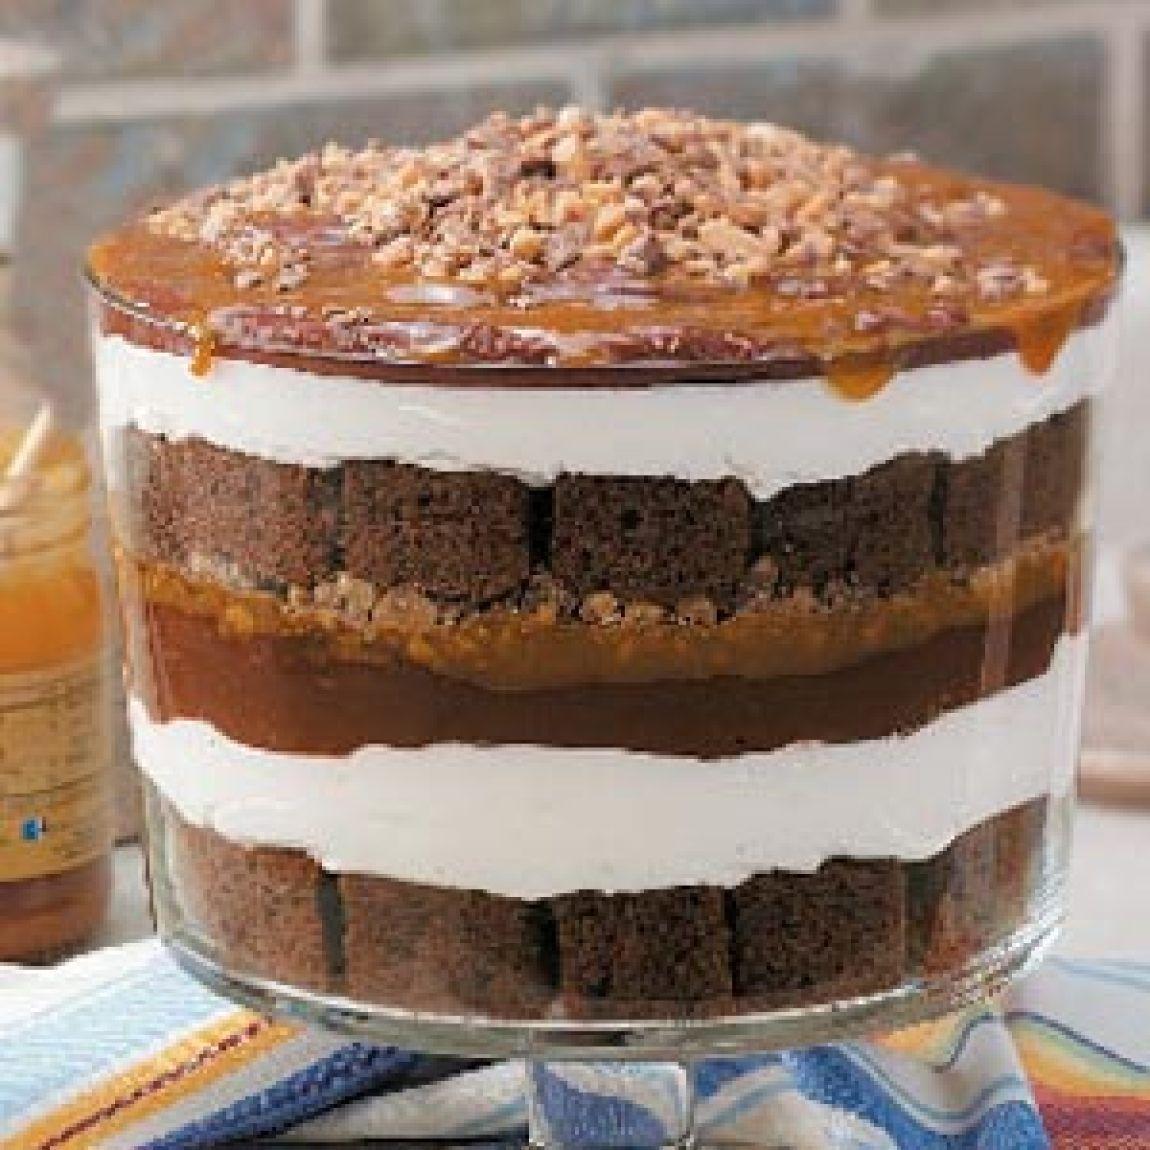 Toffee Brownie Trifle Recipe: Caramel Chocolate Trifle